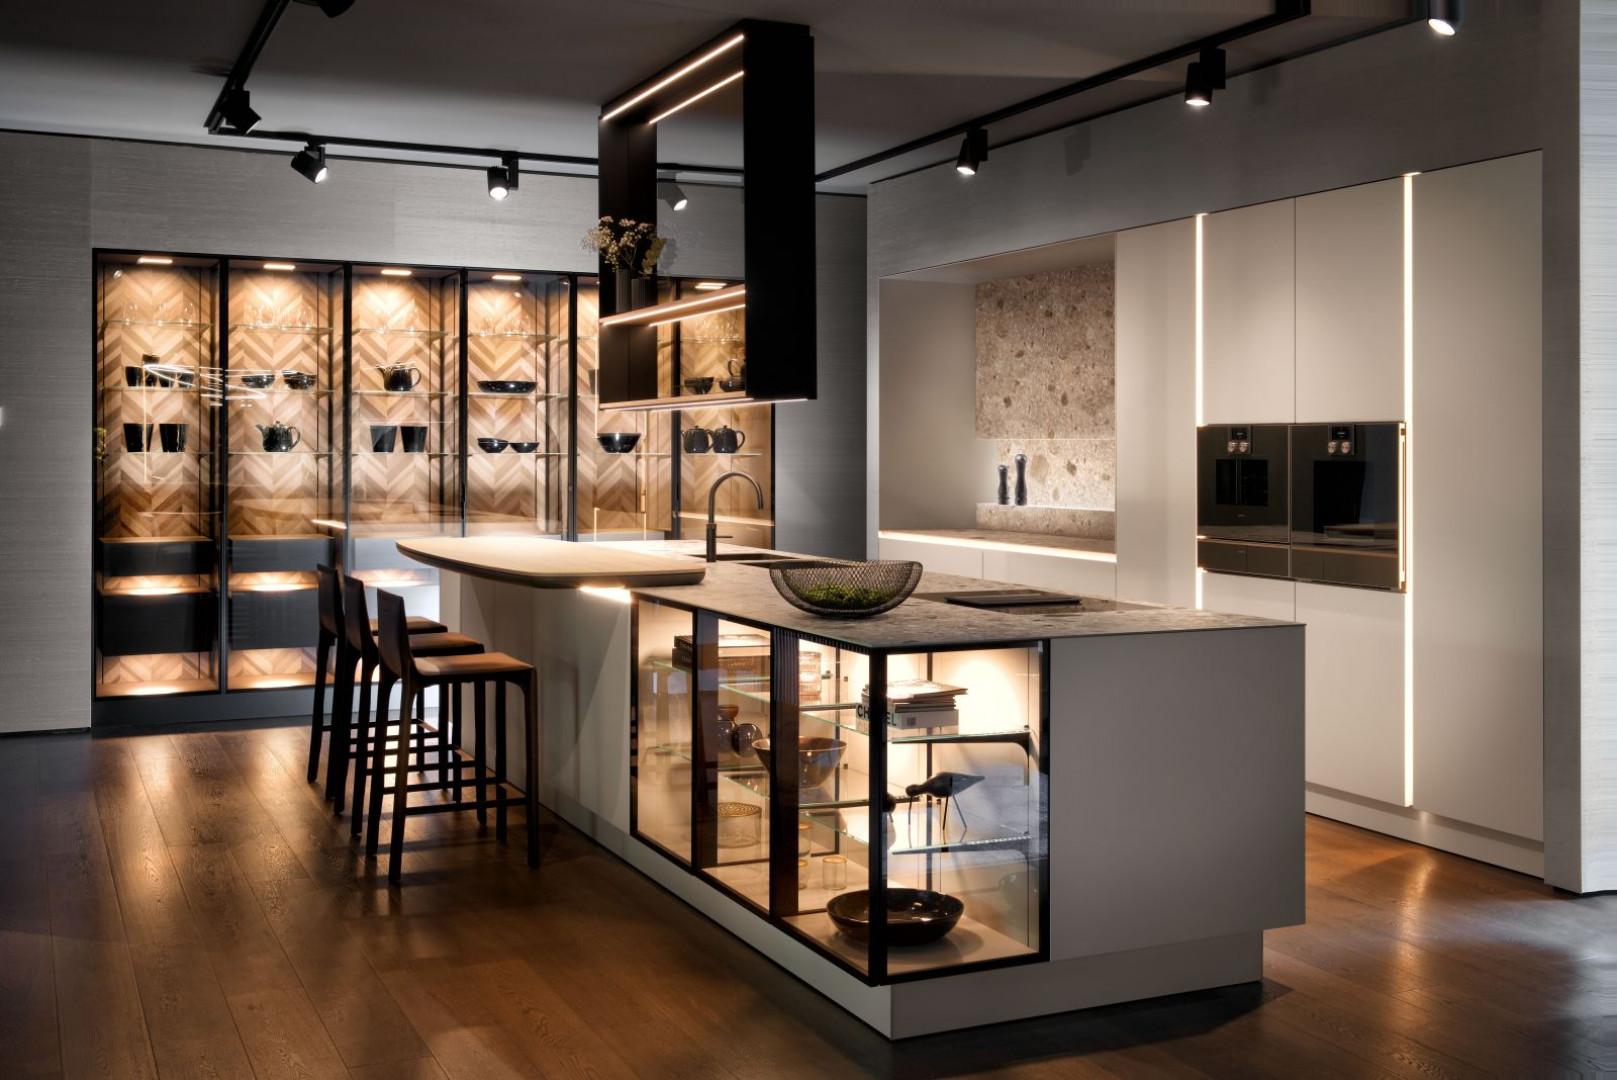 Nowa koncepcja mebli kuchennych - New Handle-Free SieMatic. Fot. SieMatic